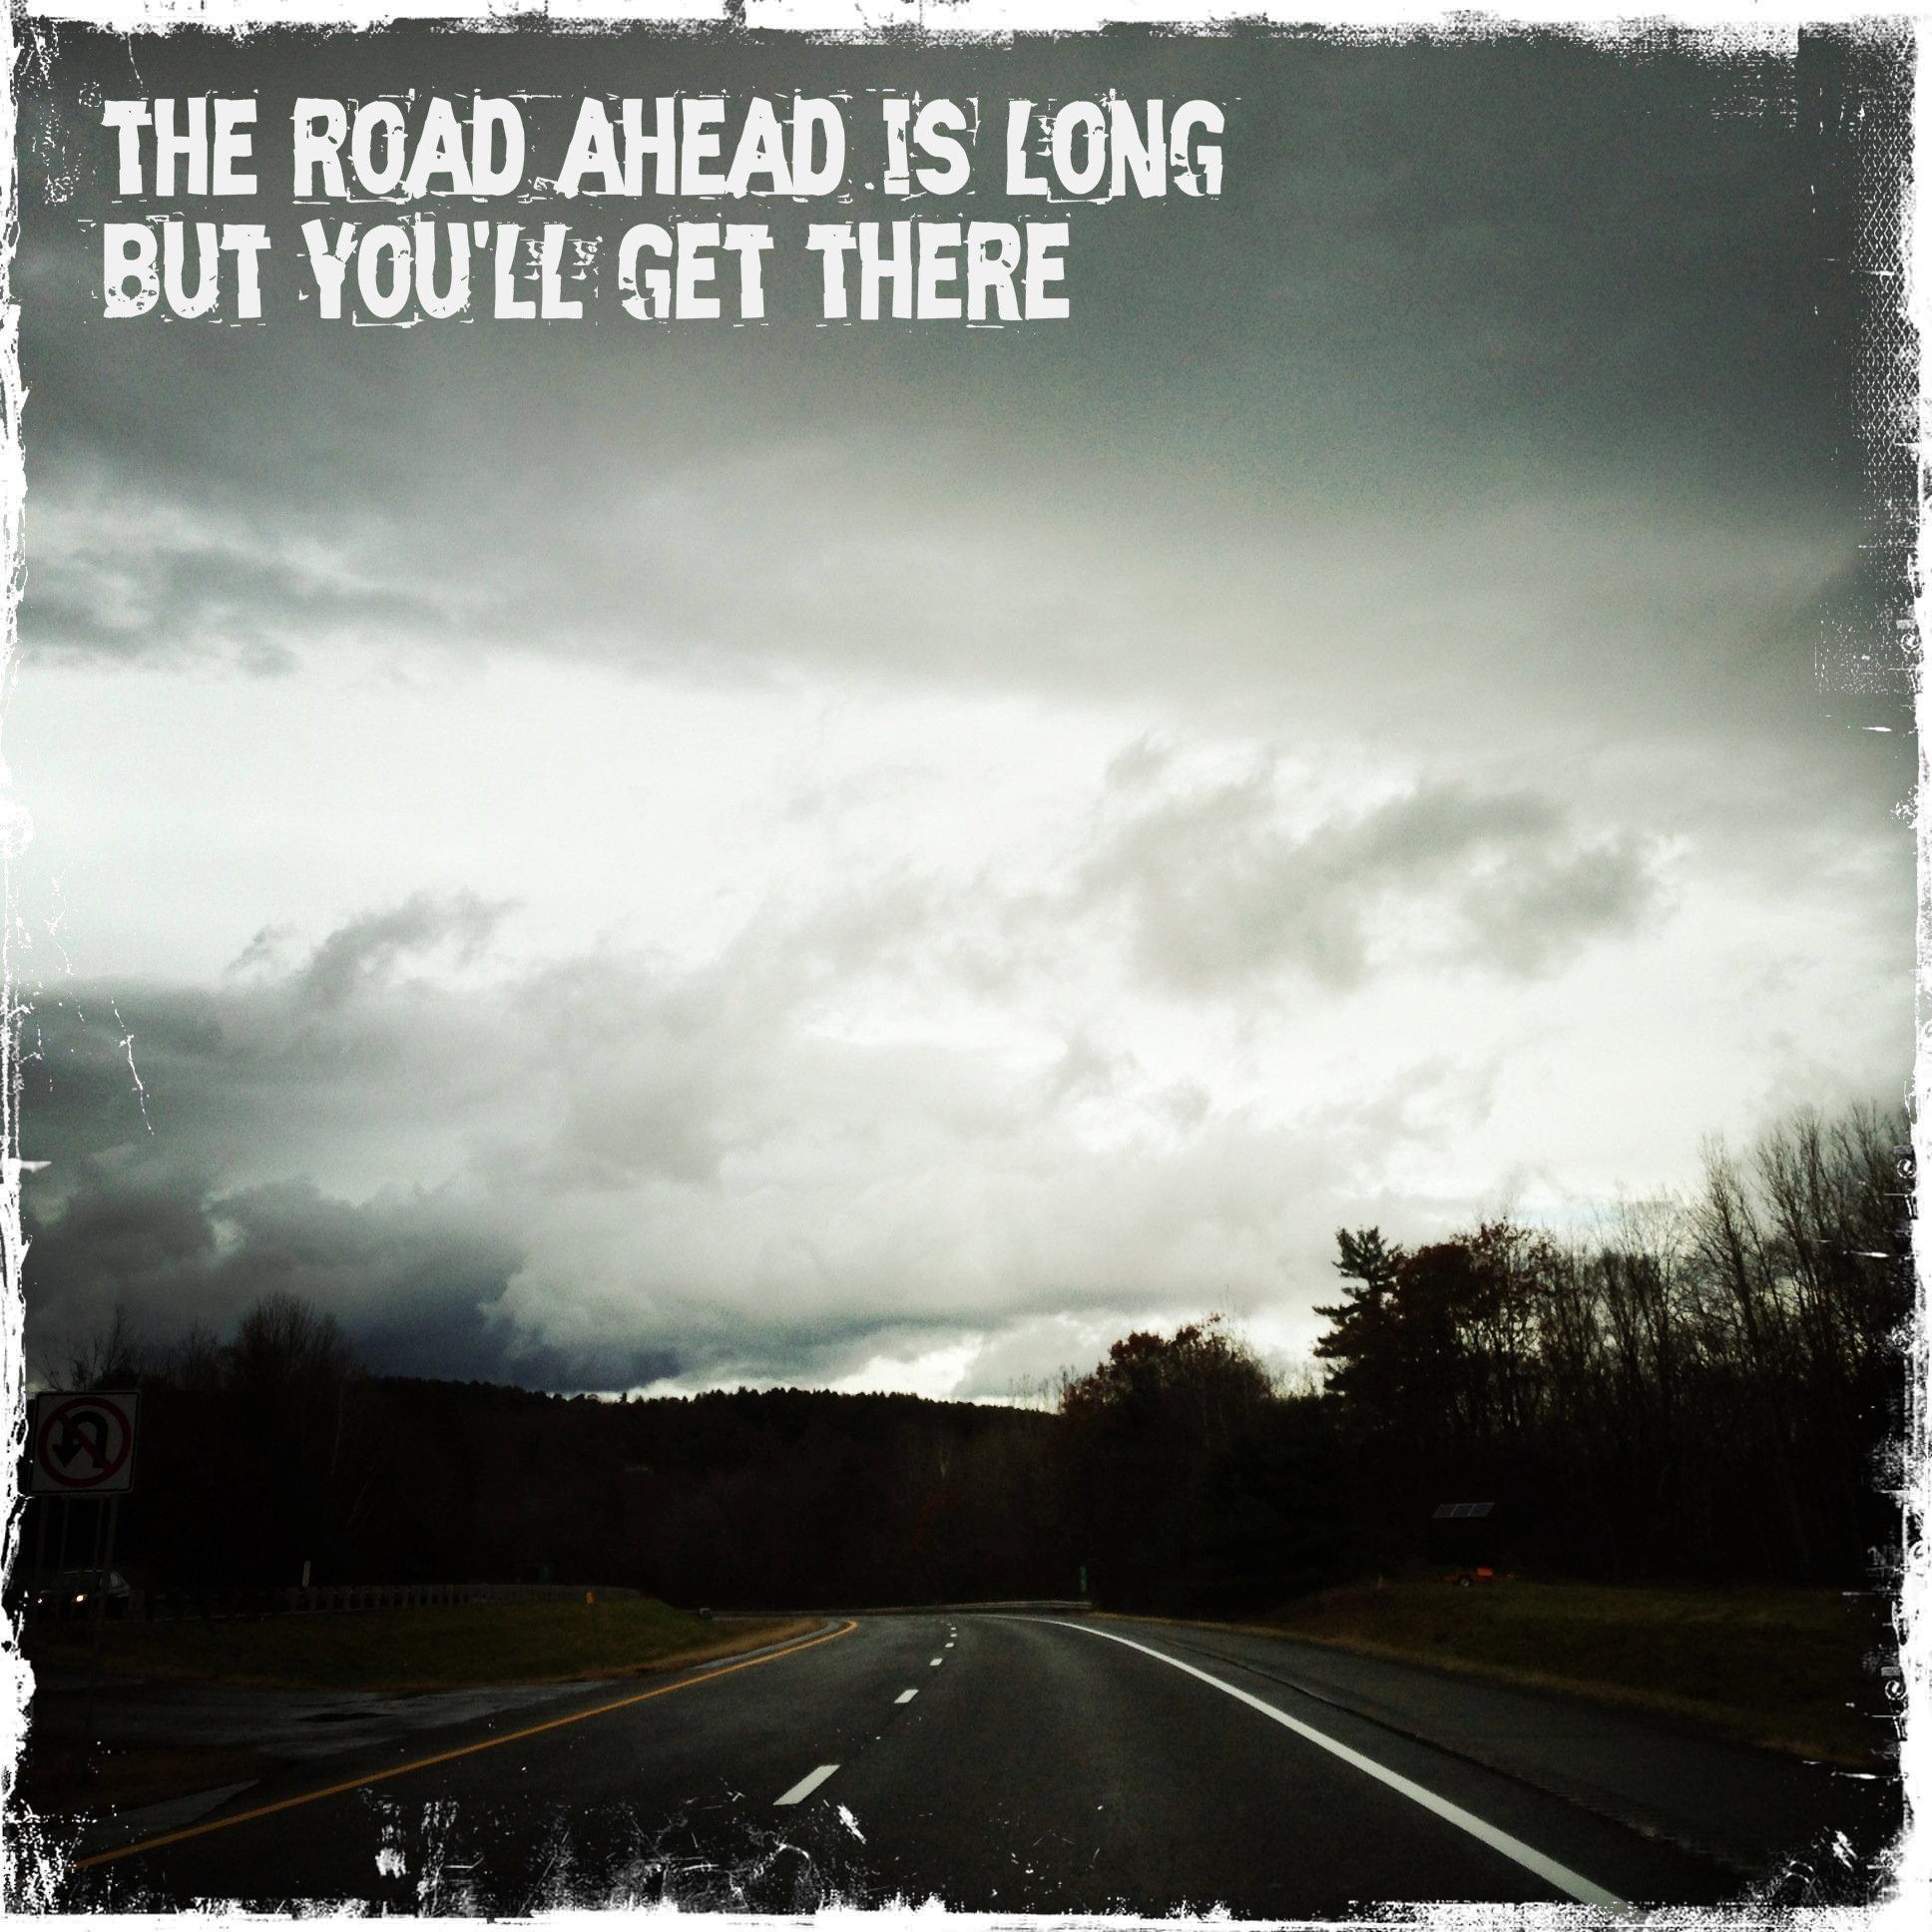 Long Road Ahead Quotes. QuotesGram